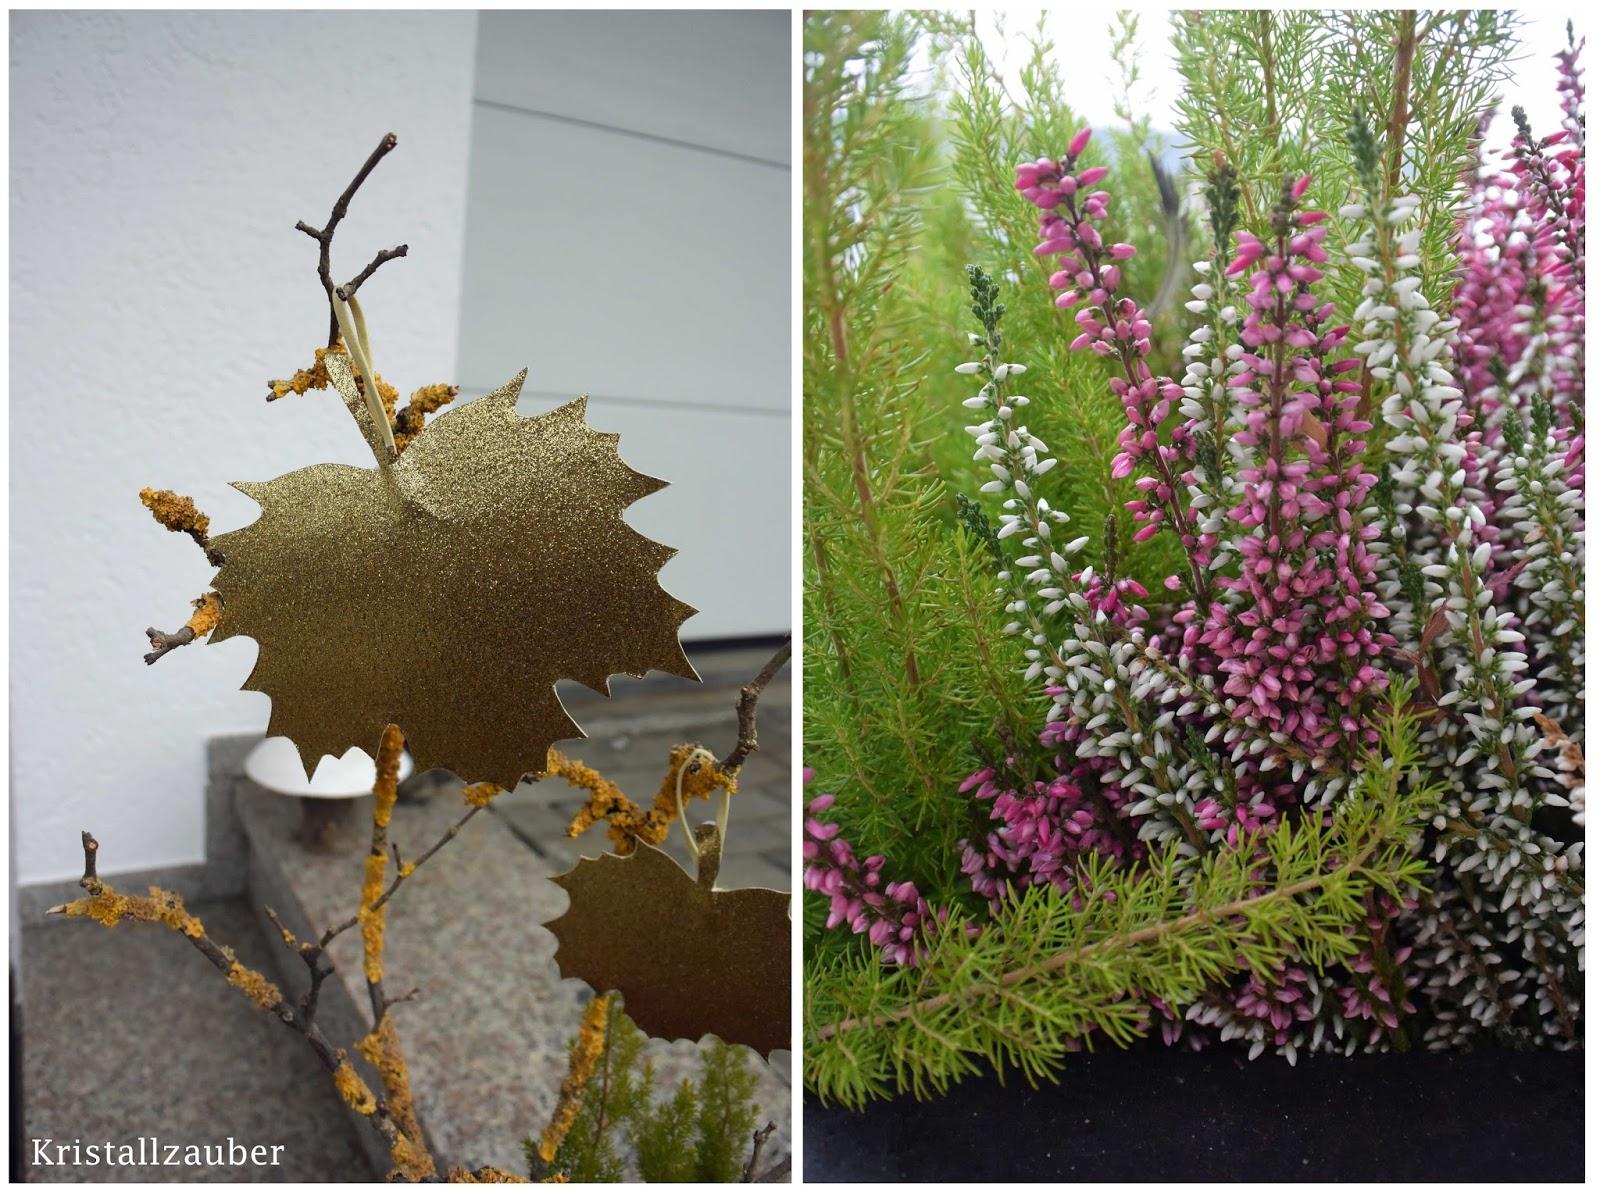 Kristallzauber diy goldene herbstbl tter f r innen und for Herbstdeko fur innen